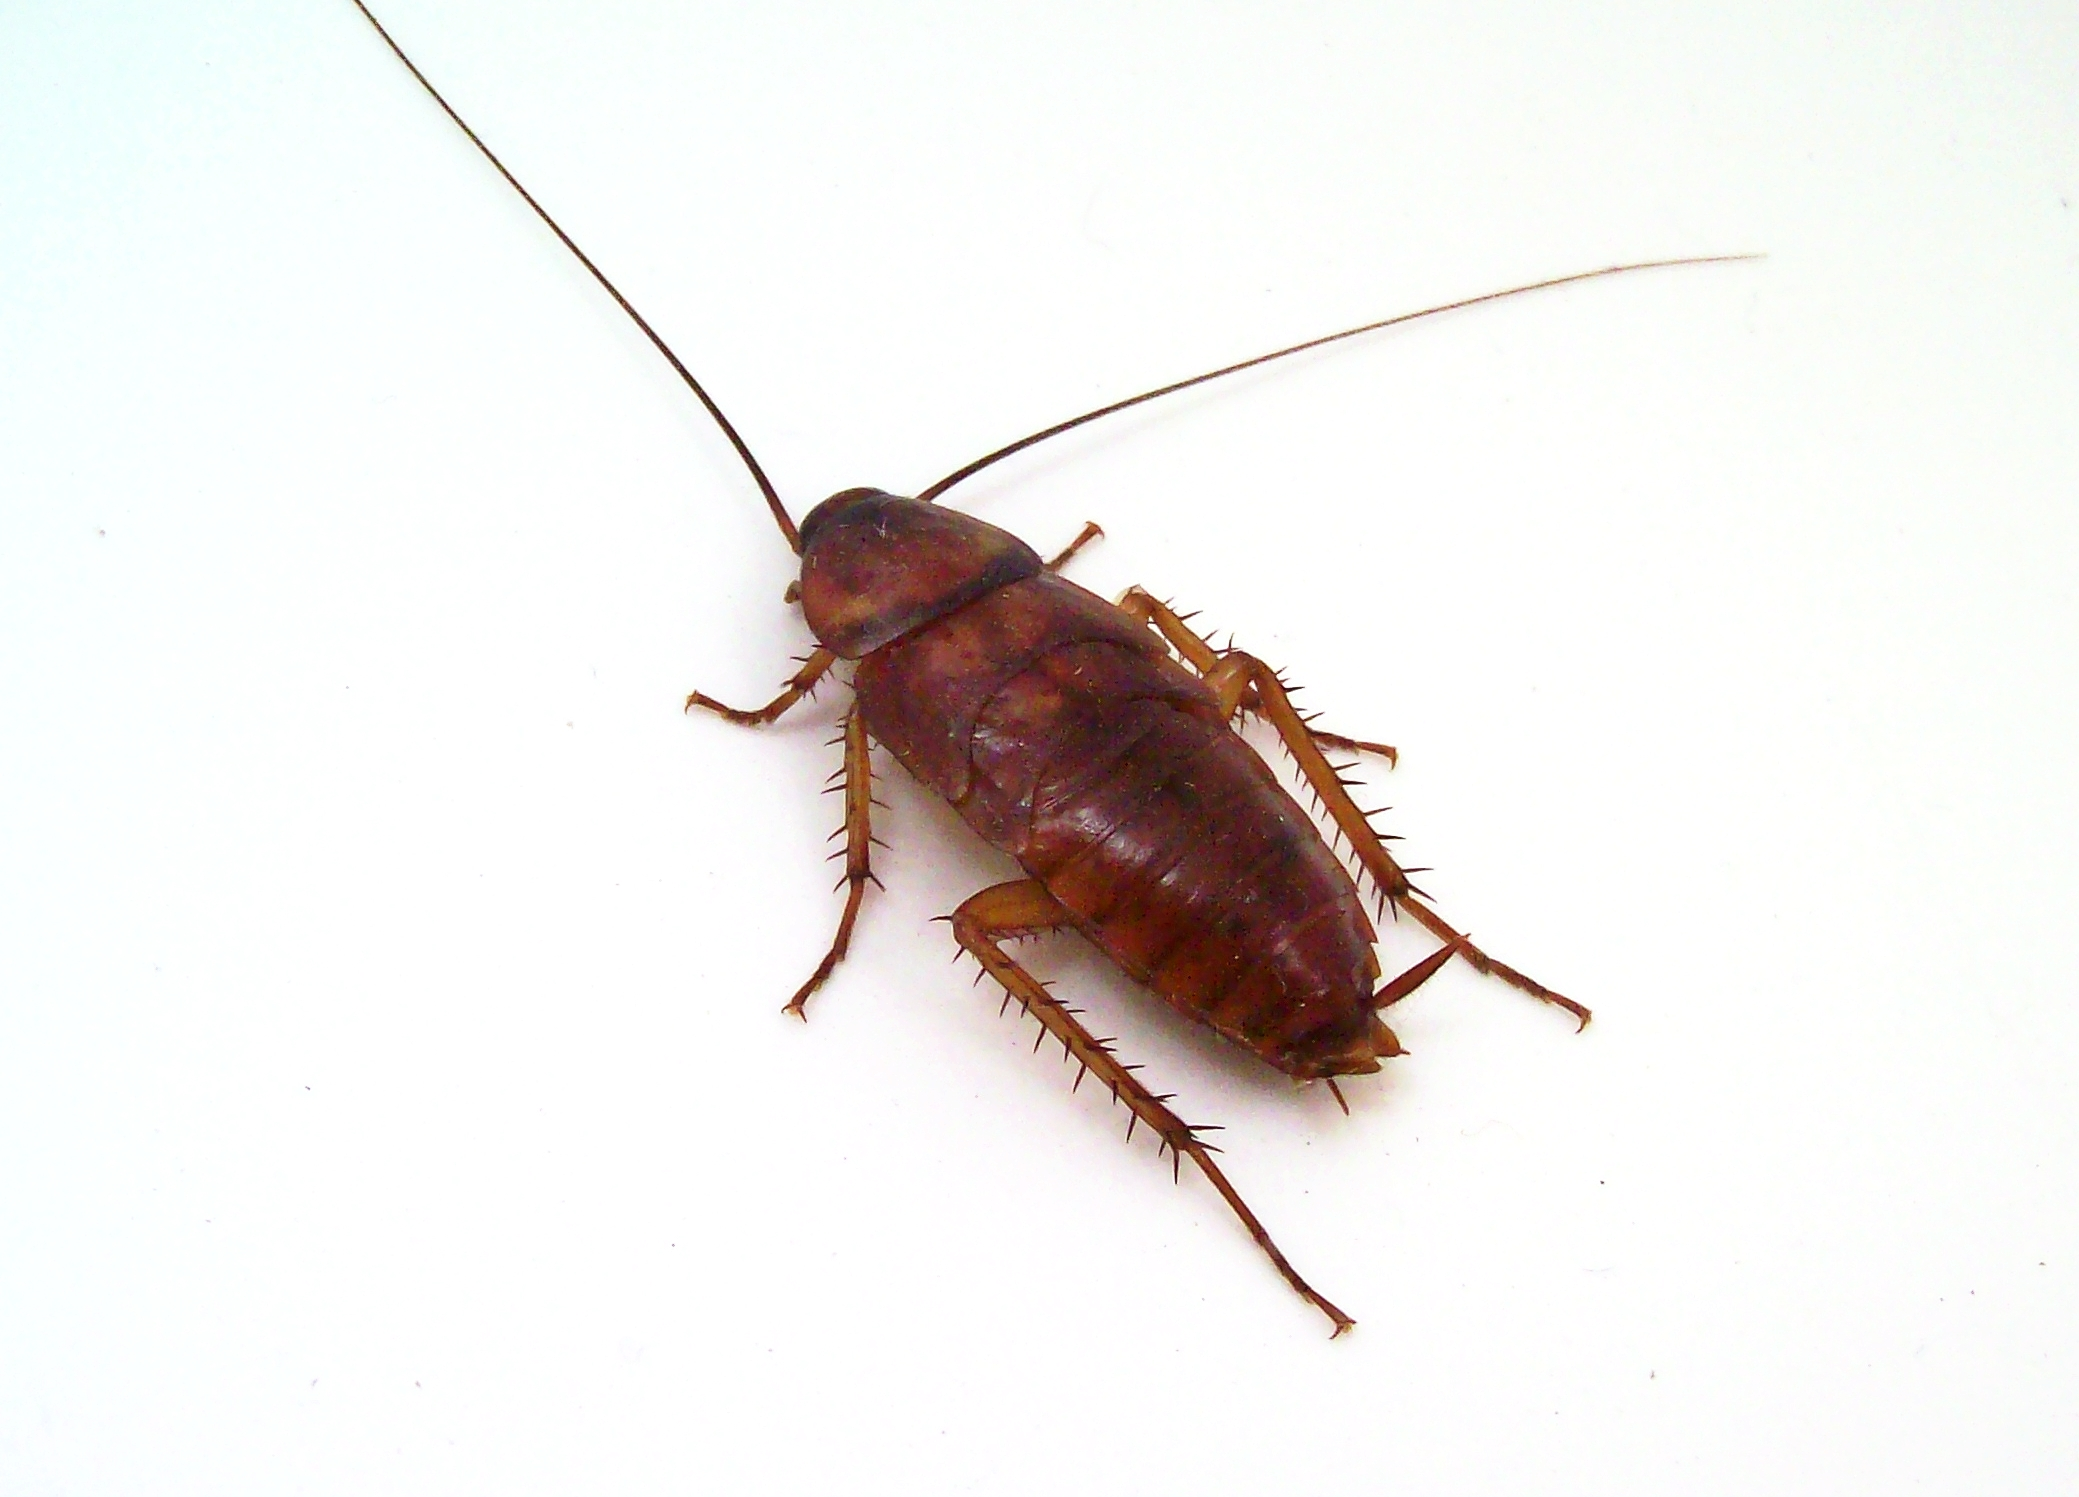 Cockroach, Animals, Legs, Hairy, Head, HQ Photo